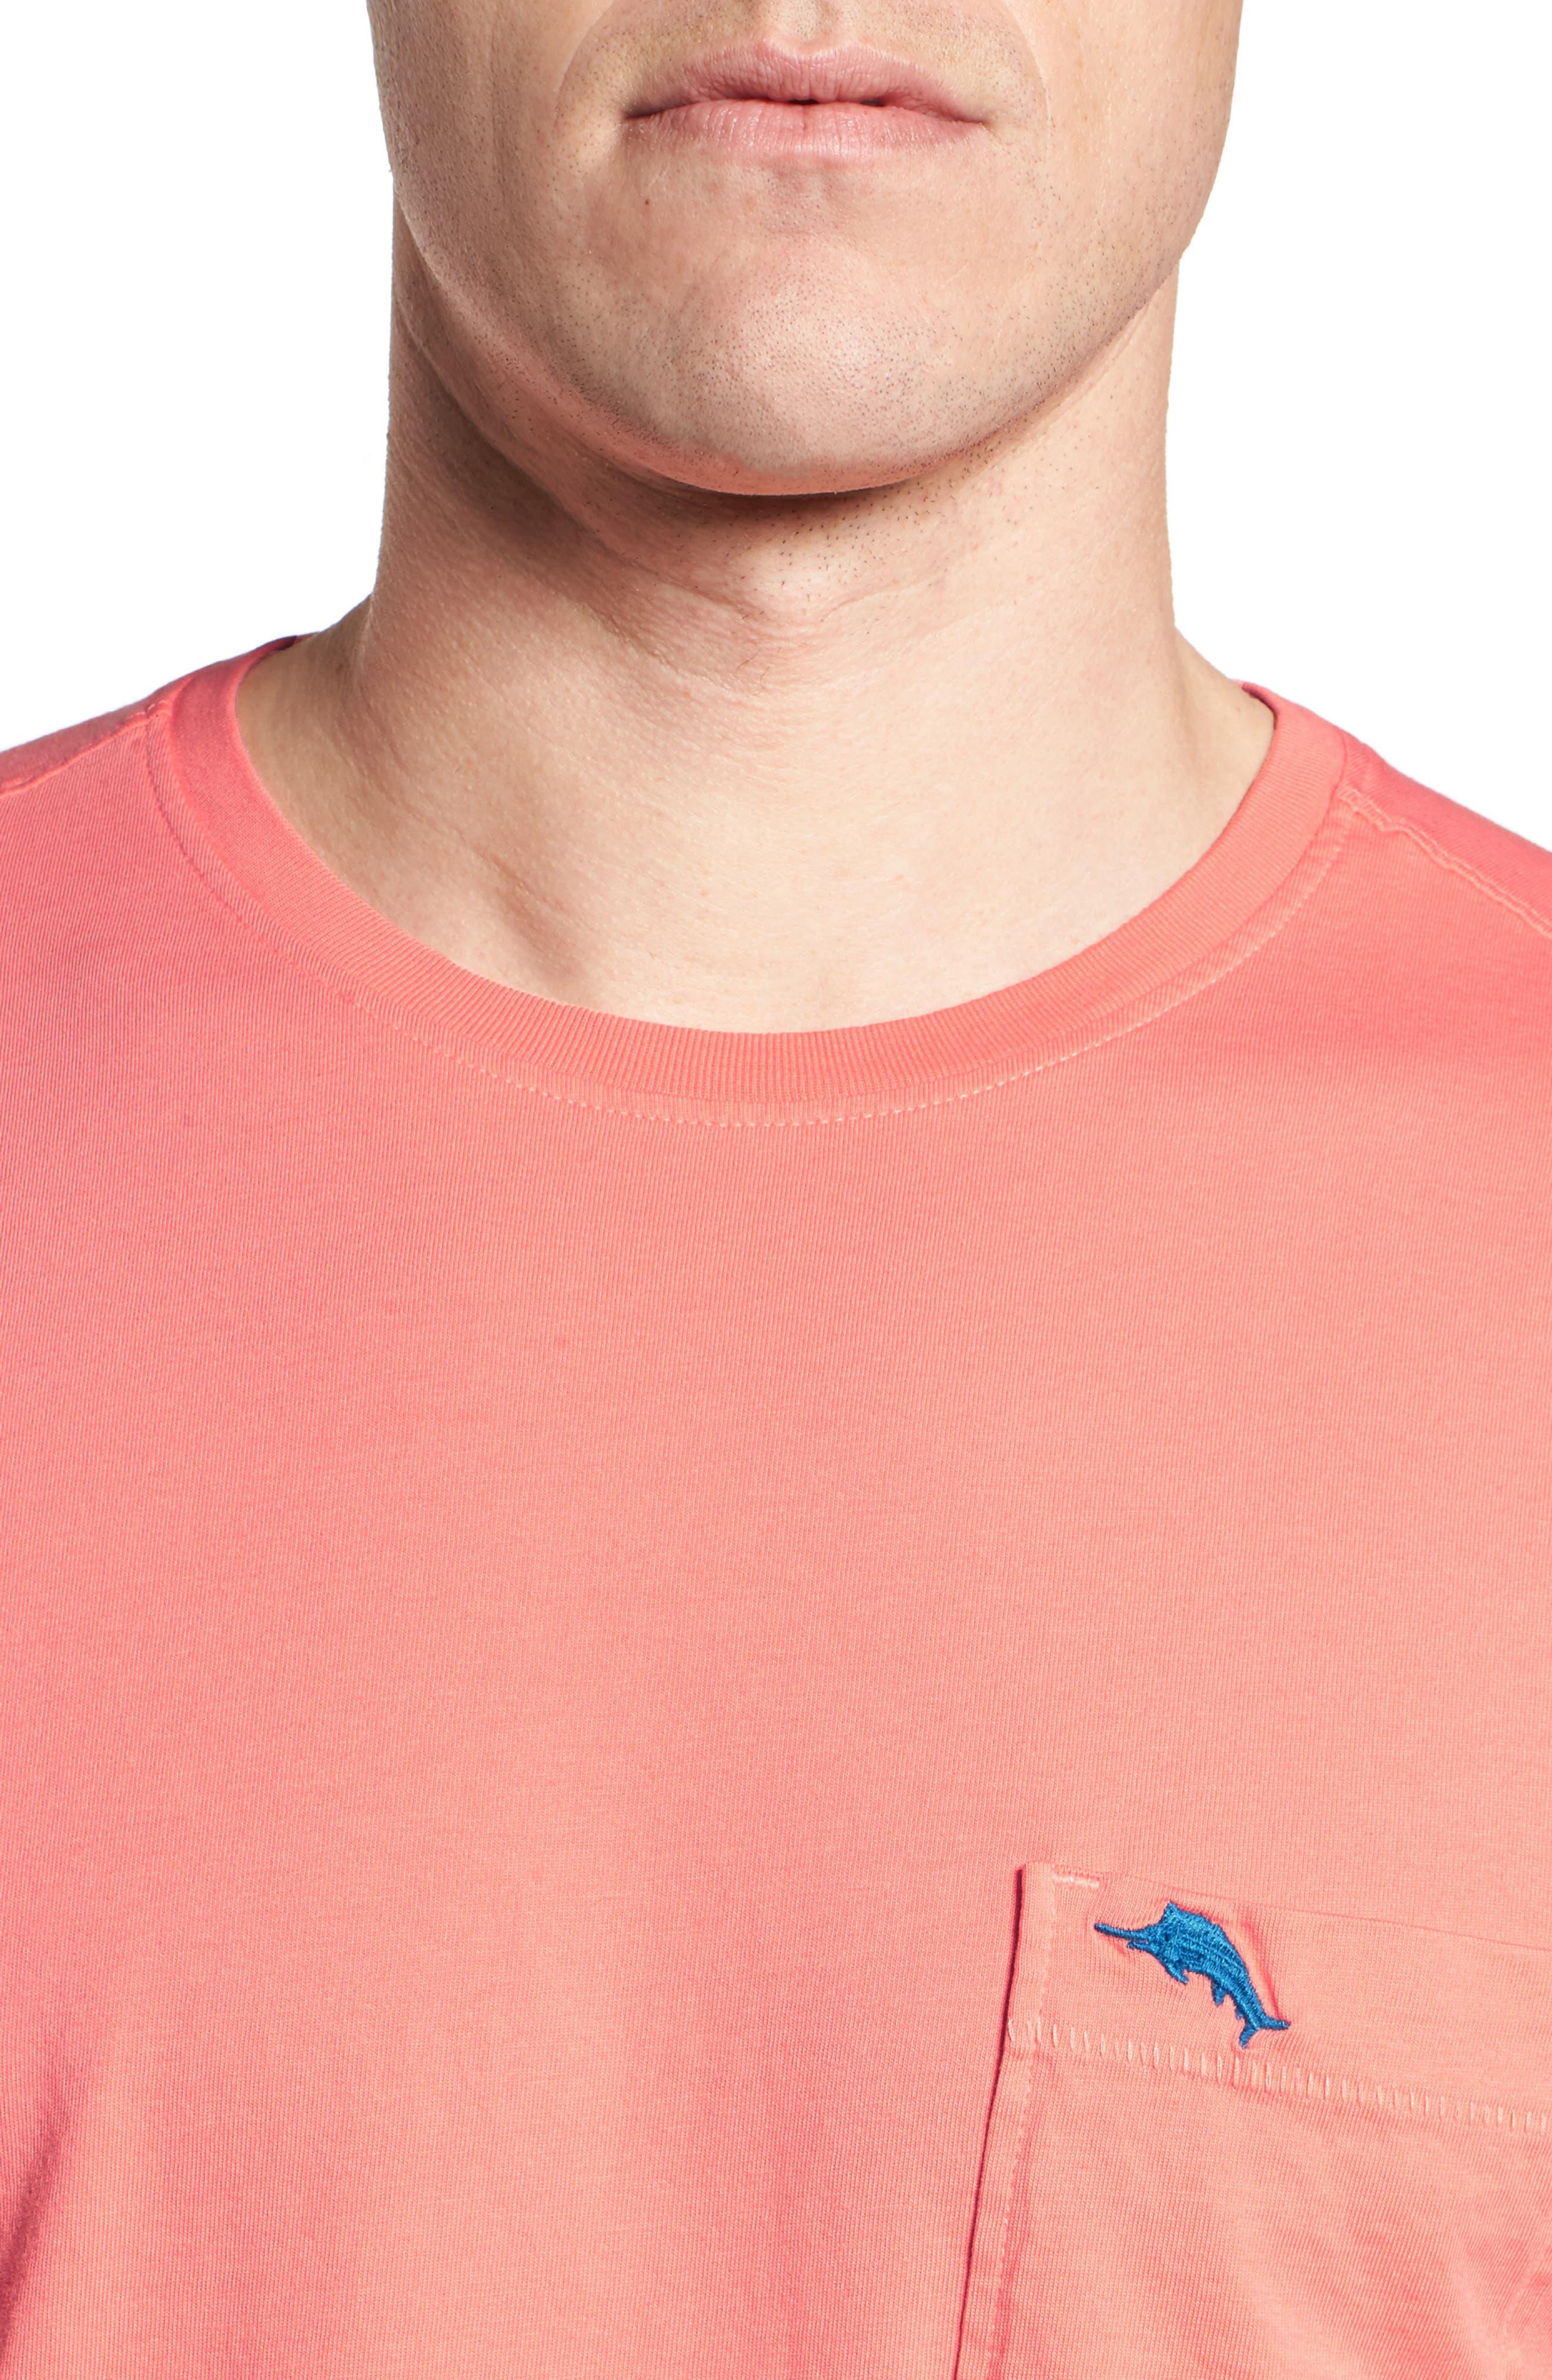 Bali Skyline T-Shirt,                             Alternate thumbnail 35, color,